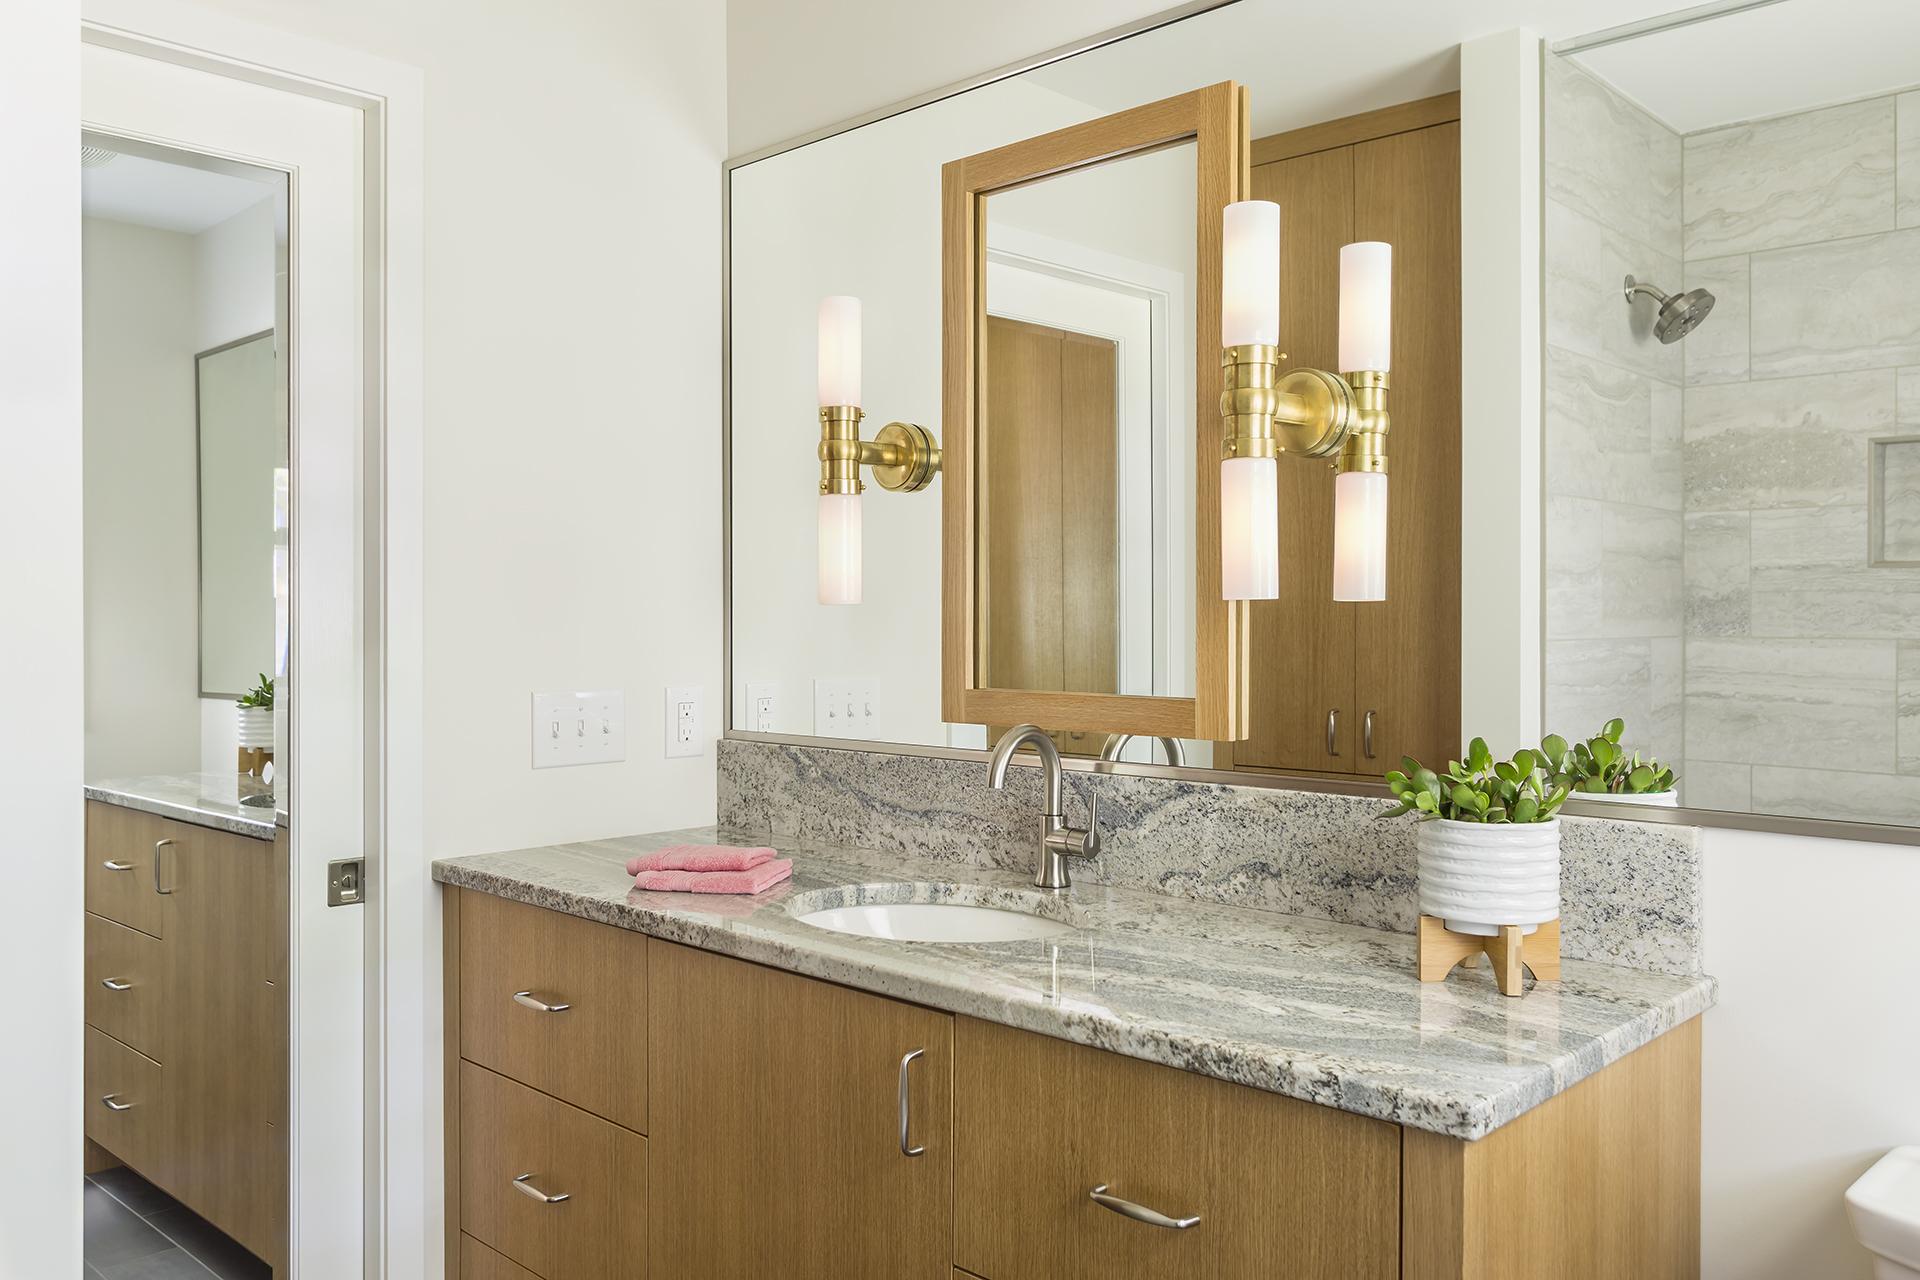 Bathroom2_LightsOn_2019_06_03.jpg